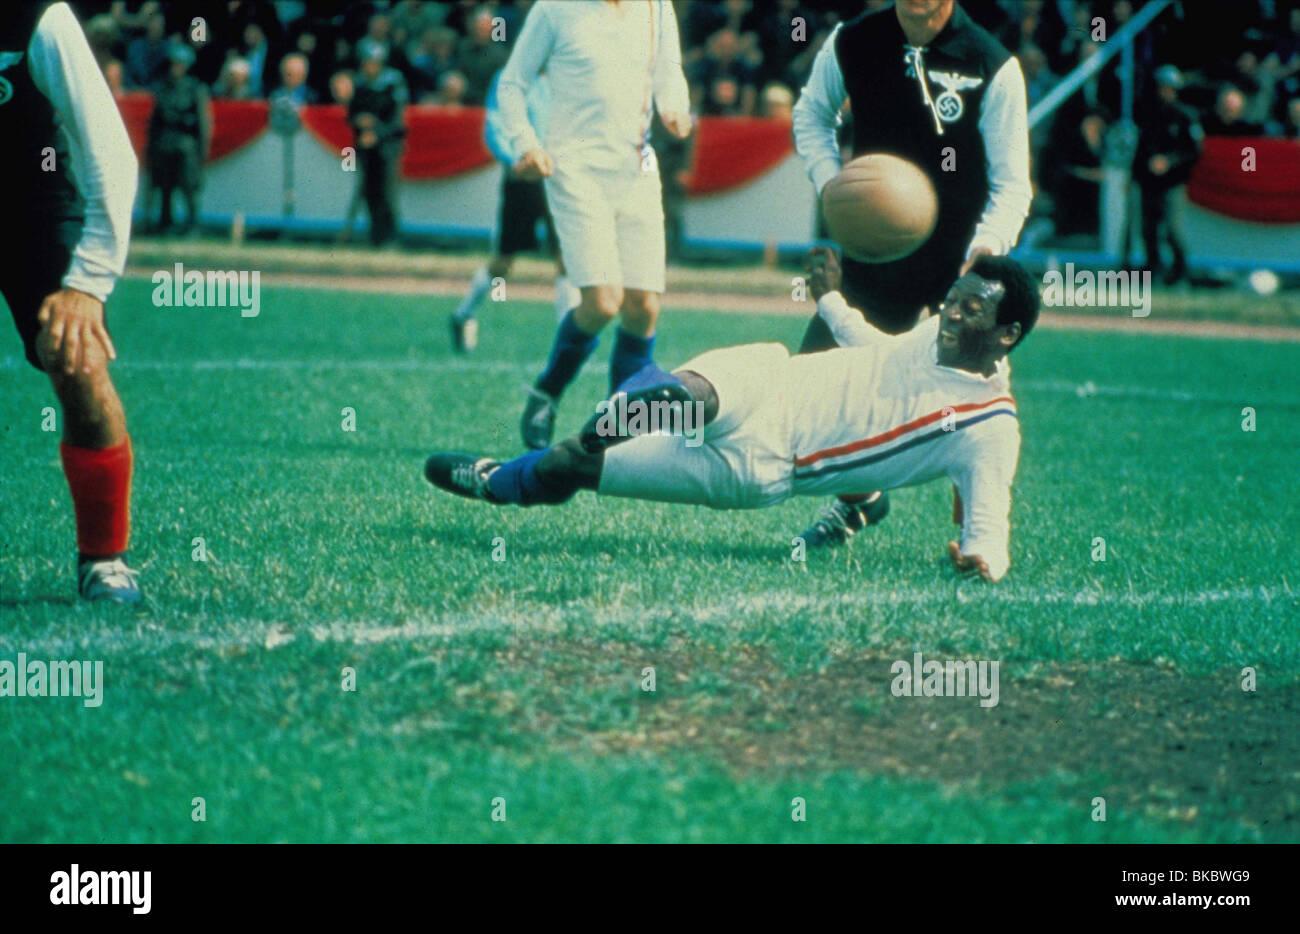 VICTORY (1981) ESCAPE TO VICTORY (ALT) PELE VIC 015 - Stock Image